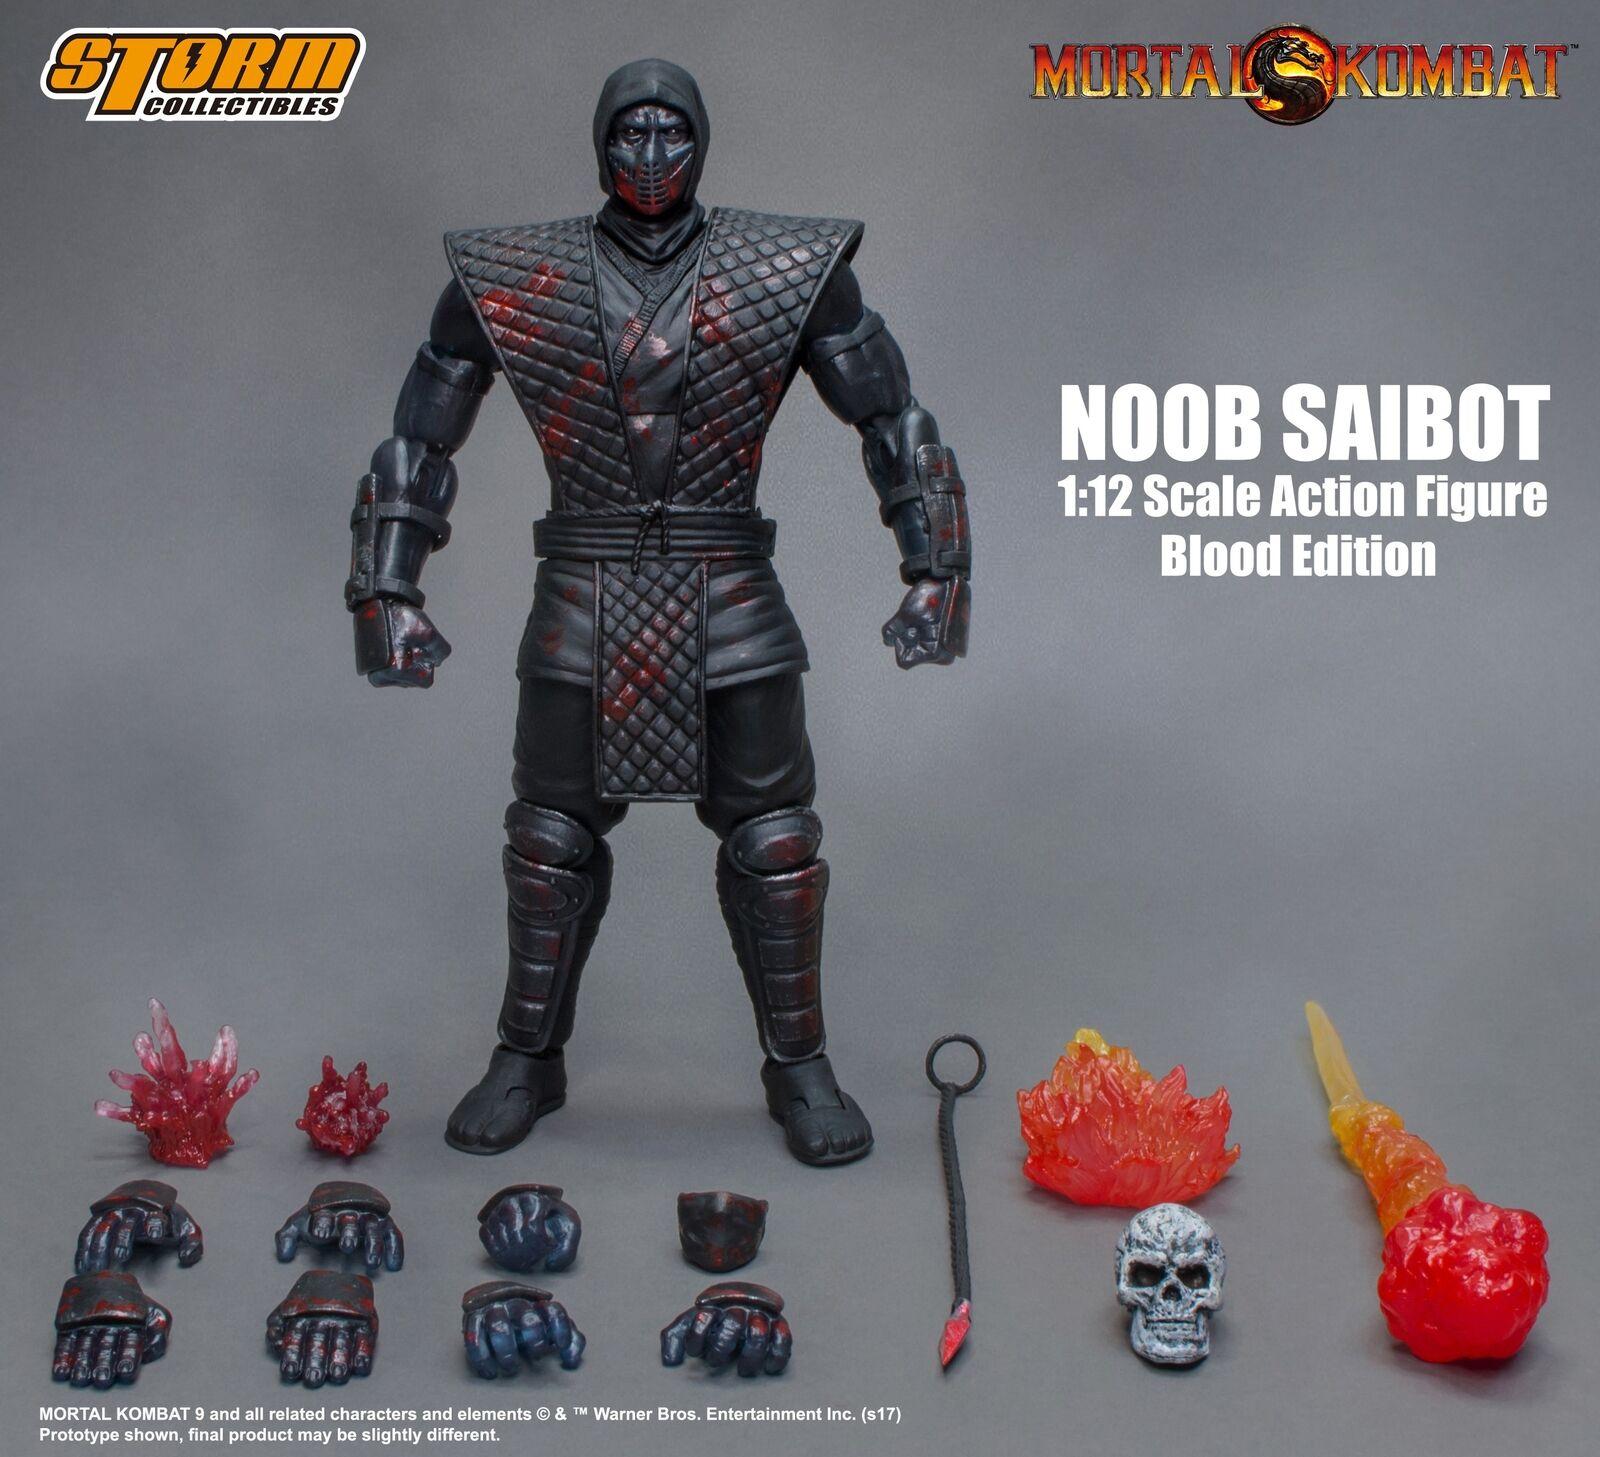 Mortal Kombat Noob Saibot figurine